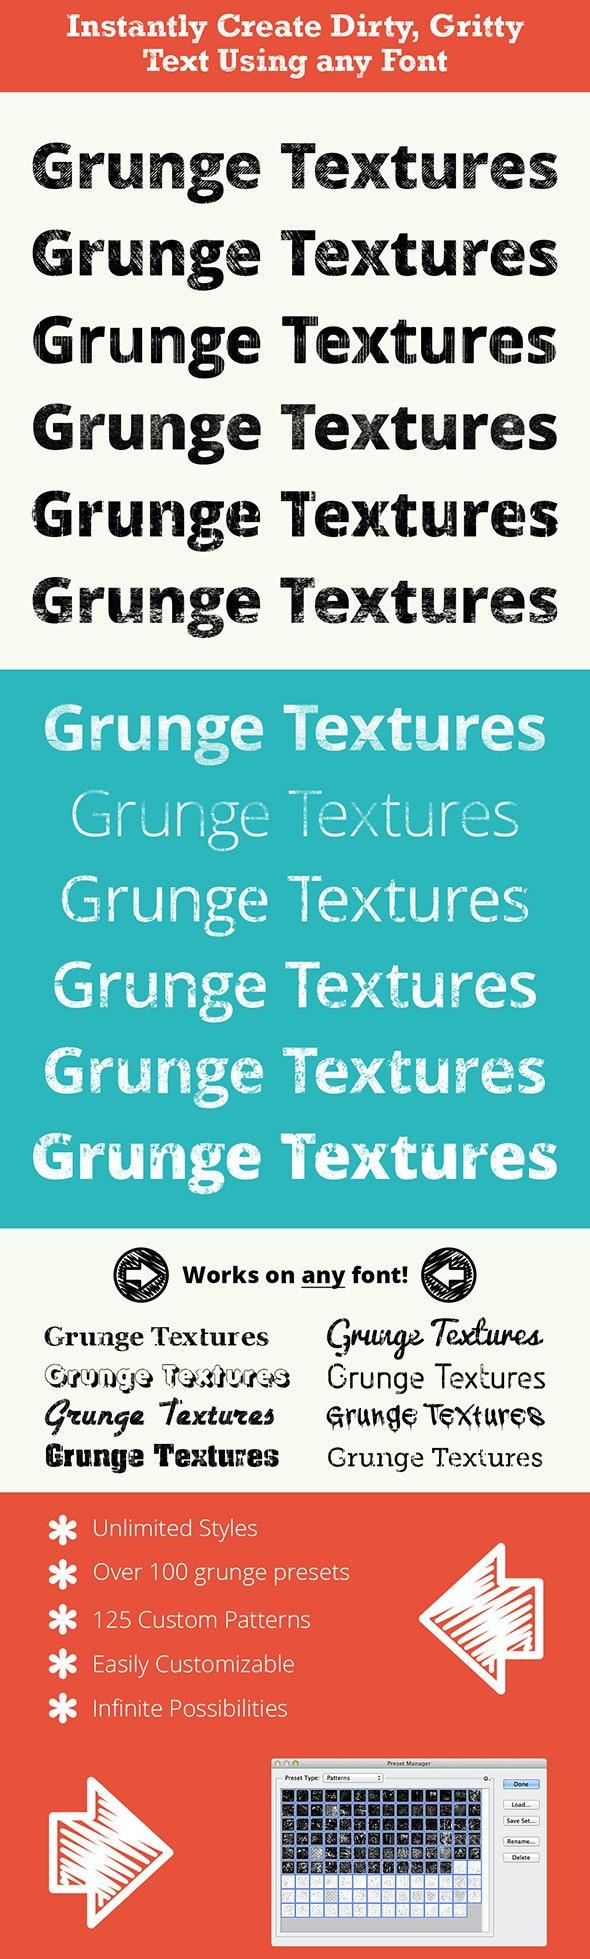 Pro Grunge Text - grunge textures - Urban Textures / Fills / Patterns